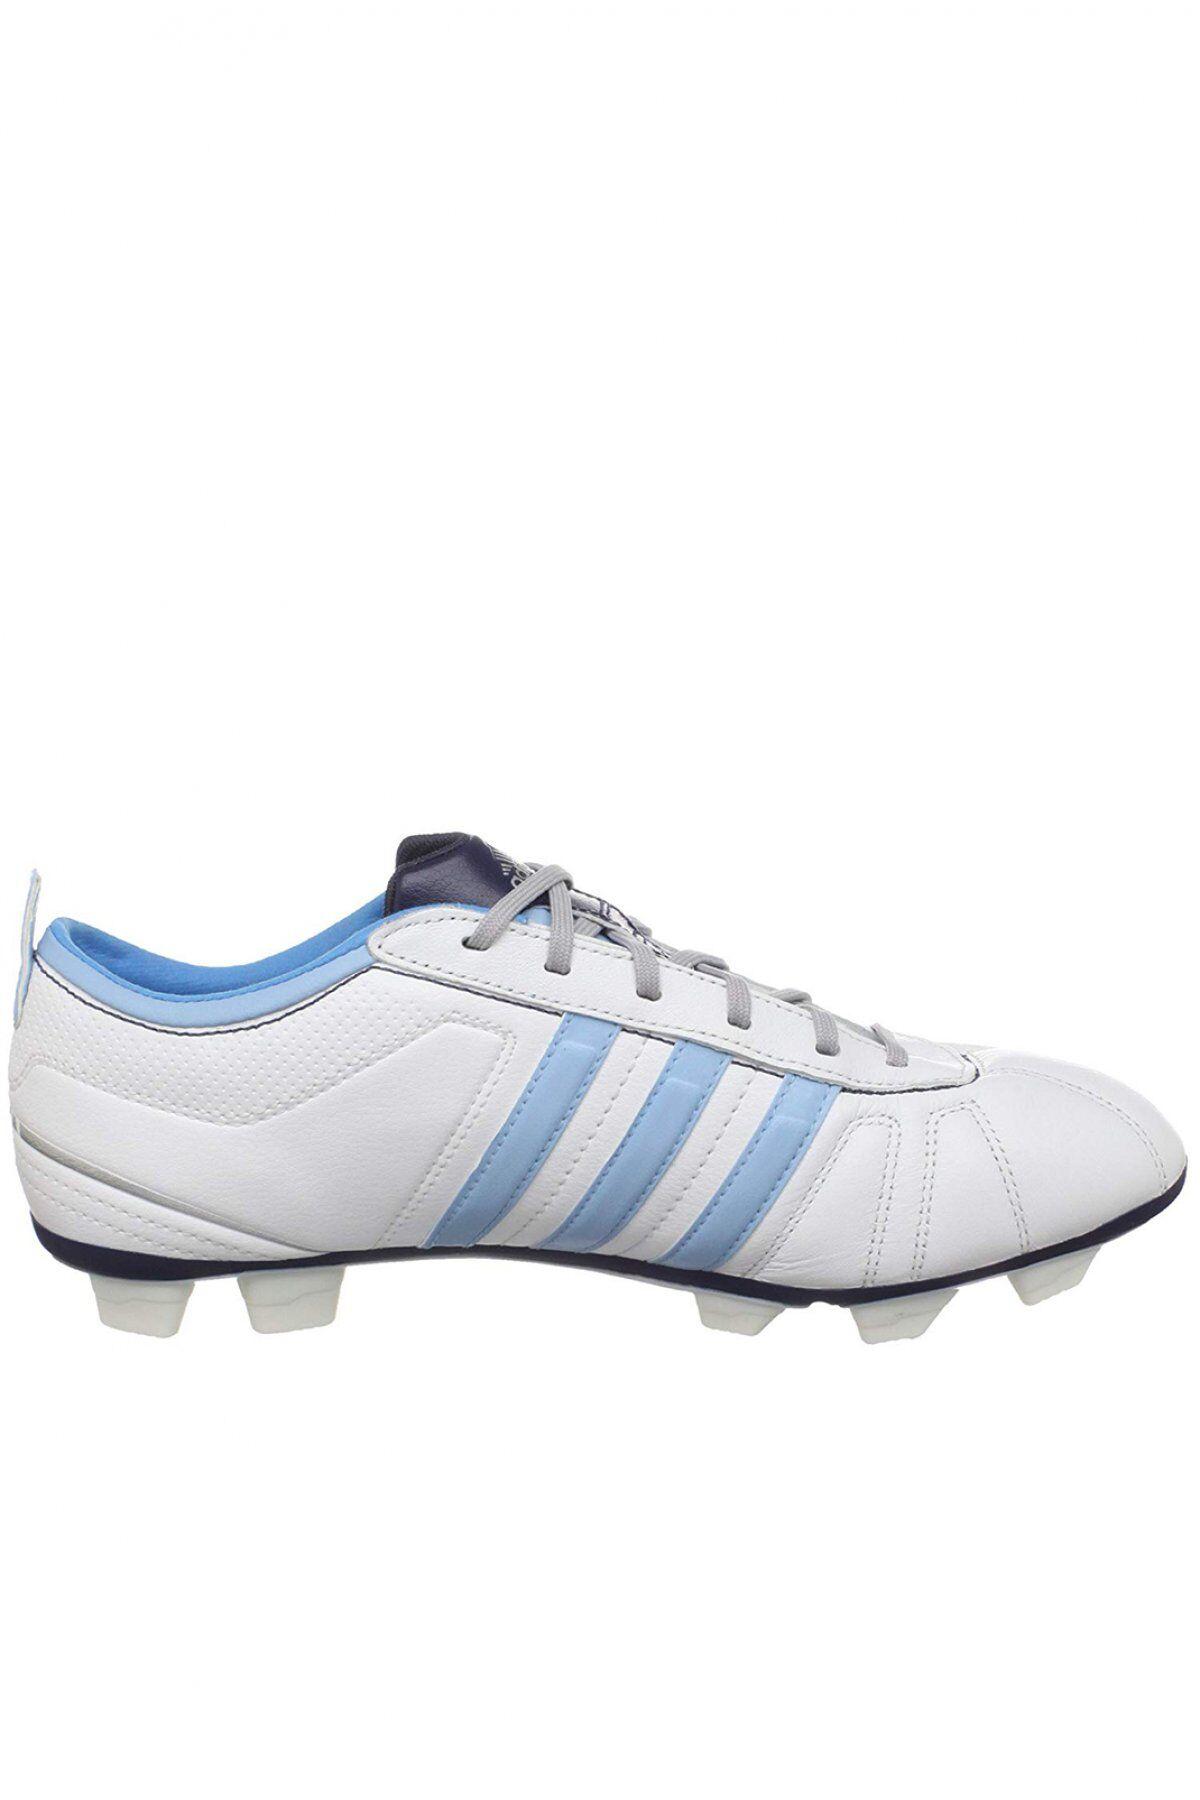 Adidas Chaussures De Football Cuir G41682 Adinova Iv  -  Adidas